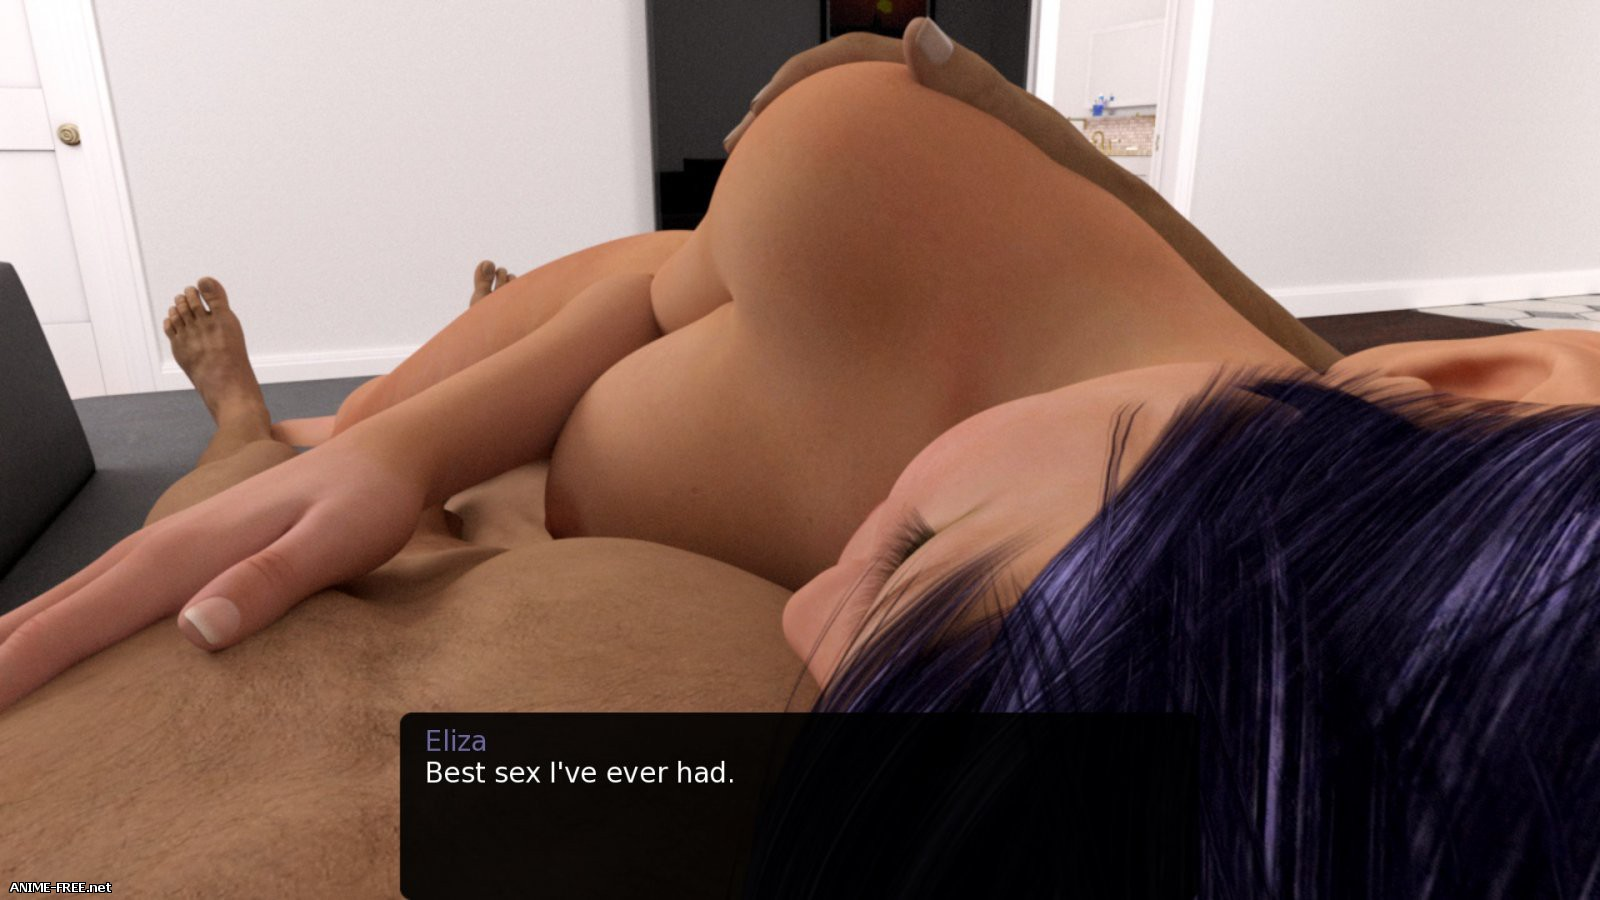 My New Roommate / Моя новая соседка по комнате [2017] [Uncen] [3DCG, ADV] [ENG] H-Game